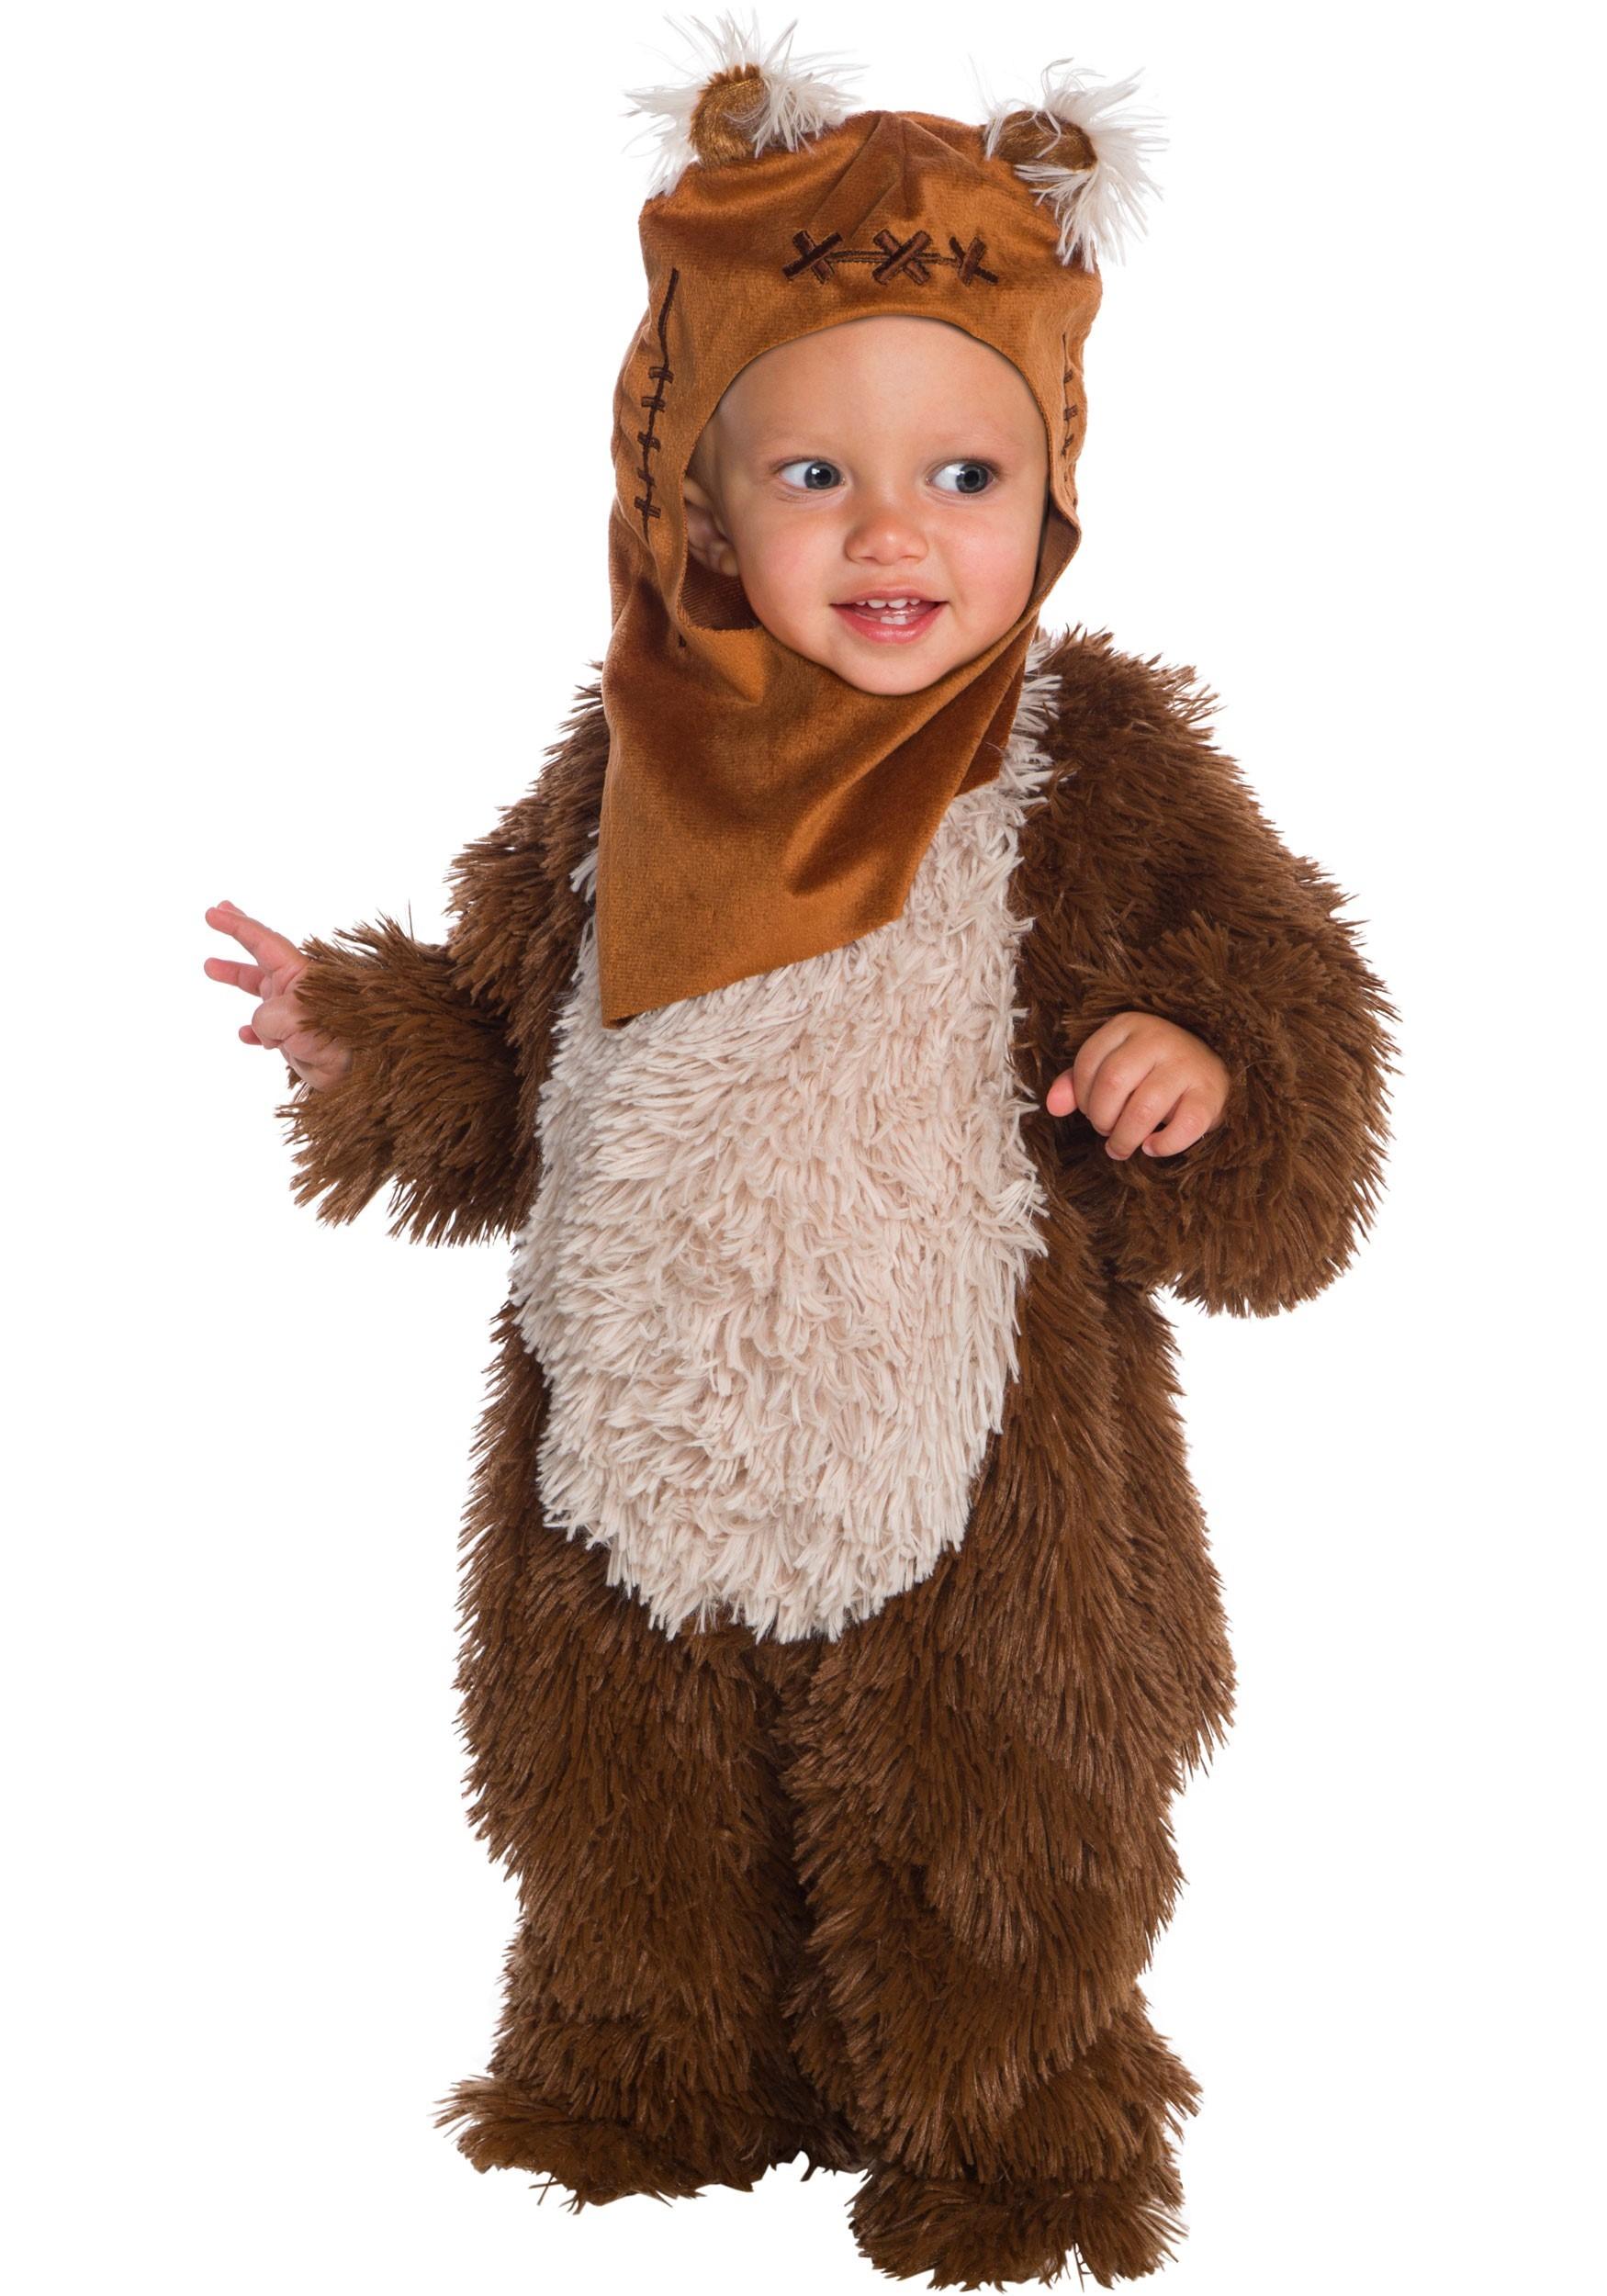 Star Wars Teddy Bear Wicket the Ewok Toddler Costume